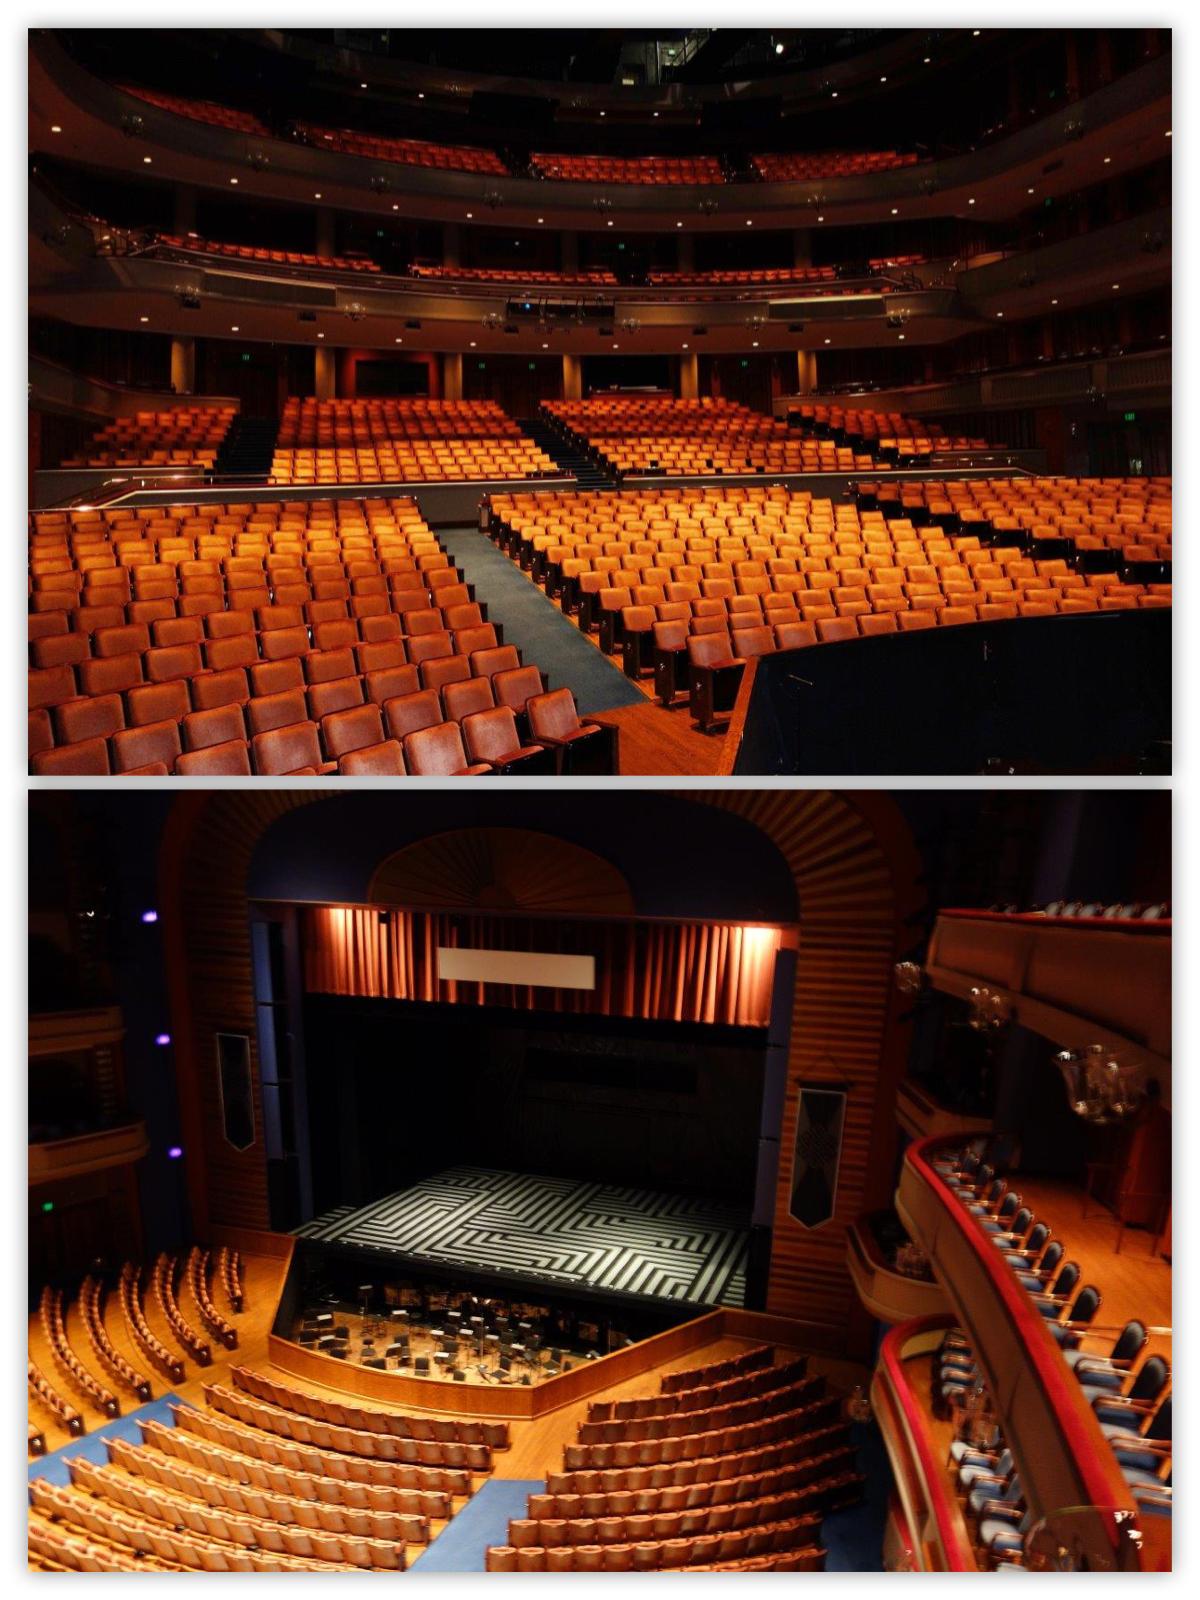 Theater Seating.jpg